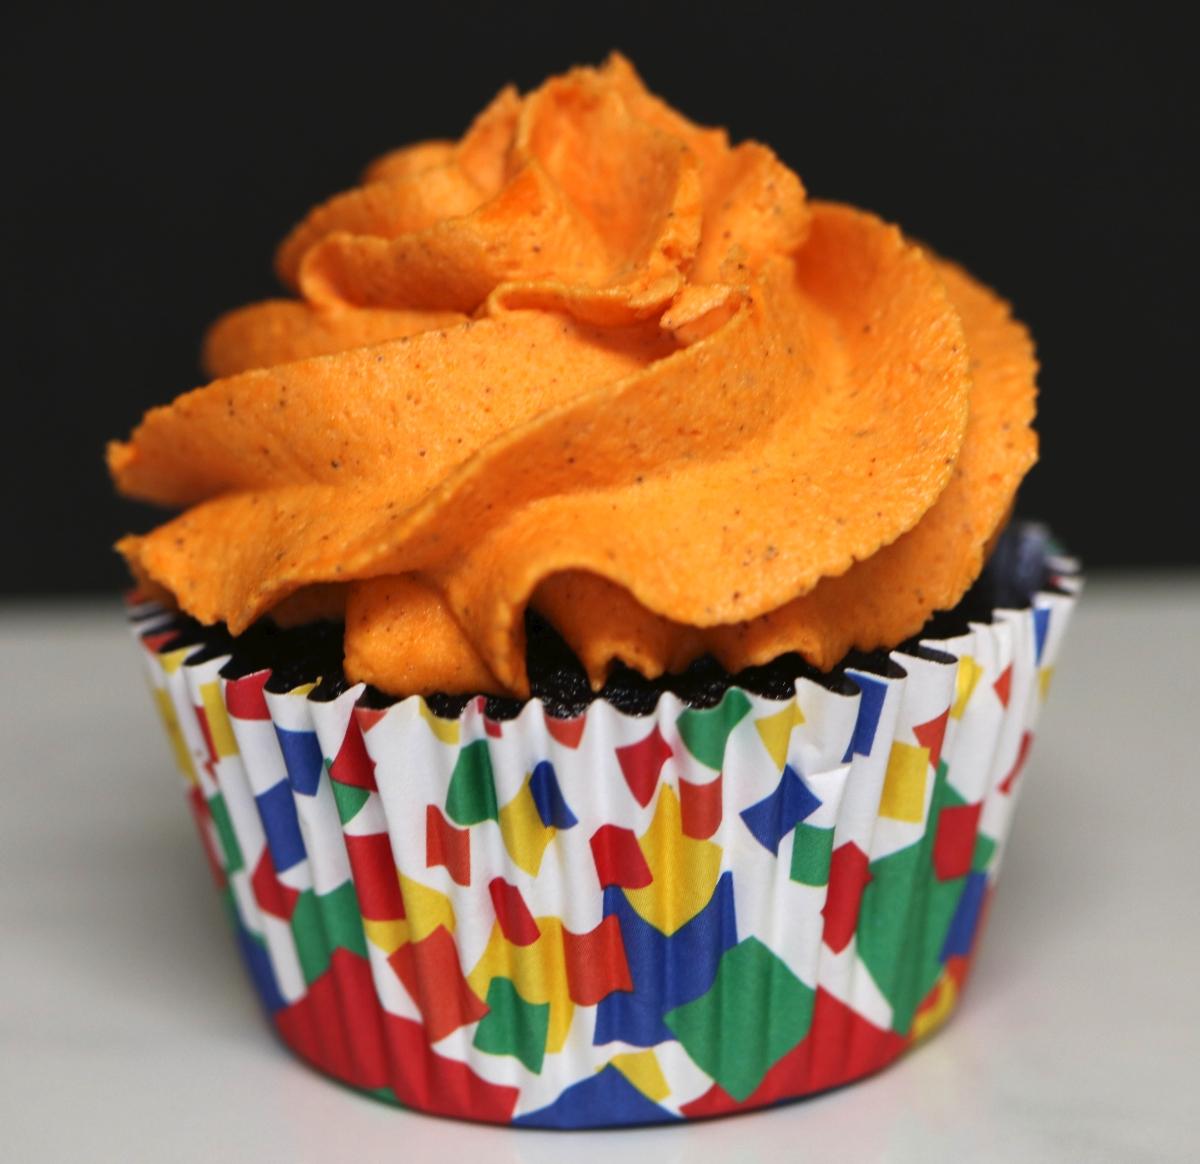 chocolate orange spice cupcake baked by lisa maliga